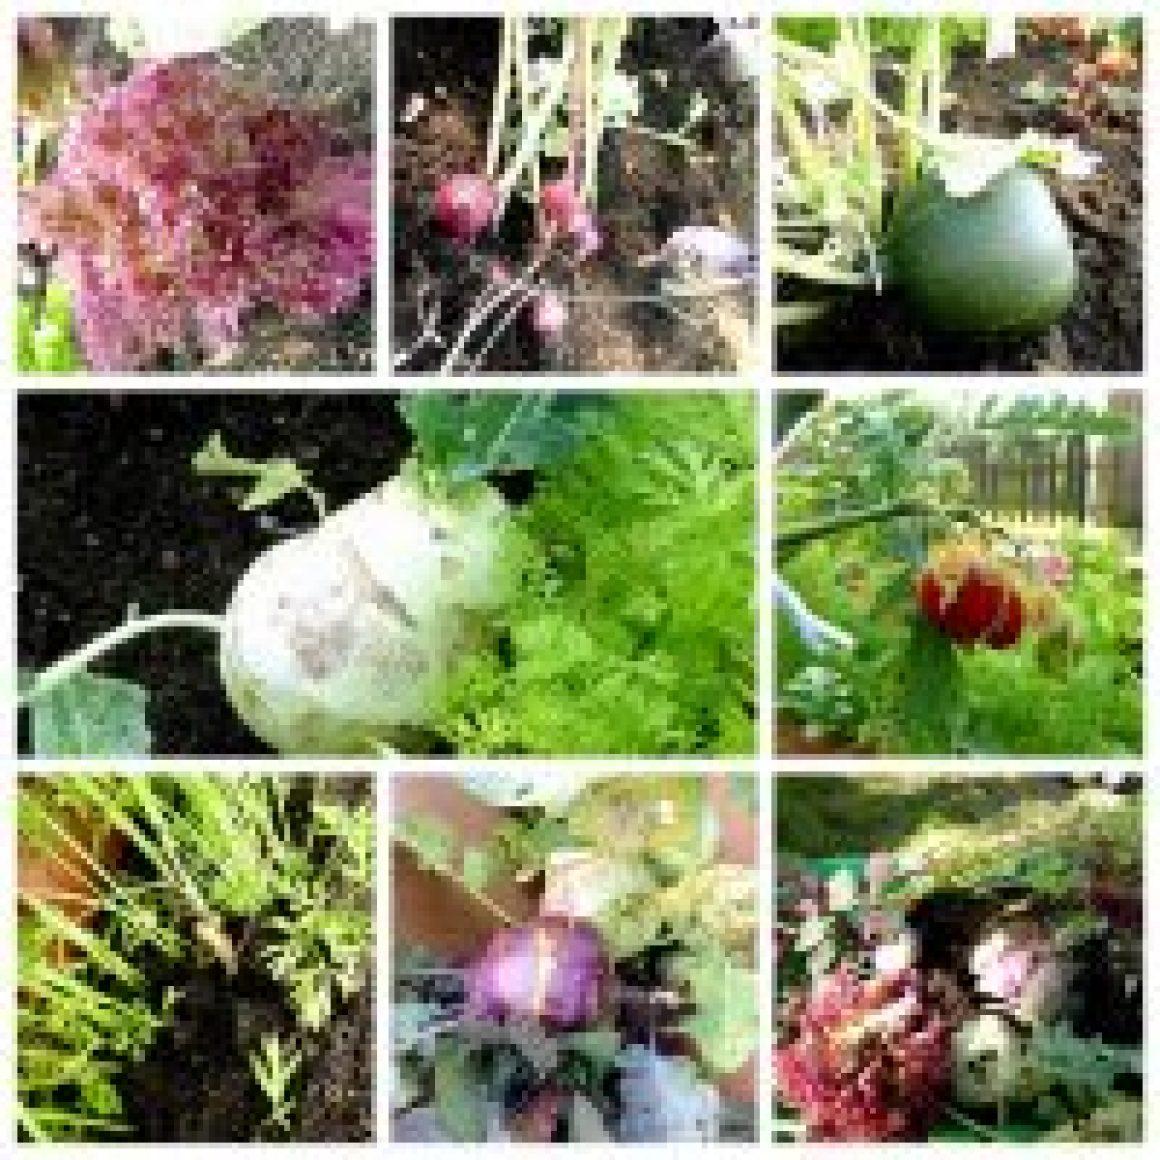 Kita Jersbek Gemüsebeet Aktion 2019